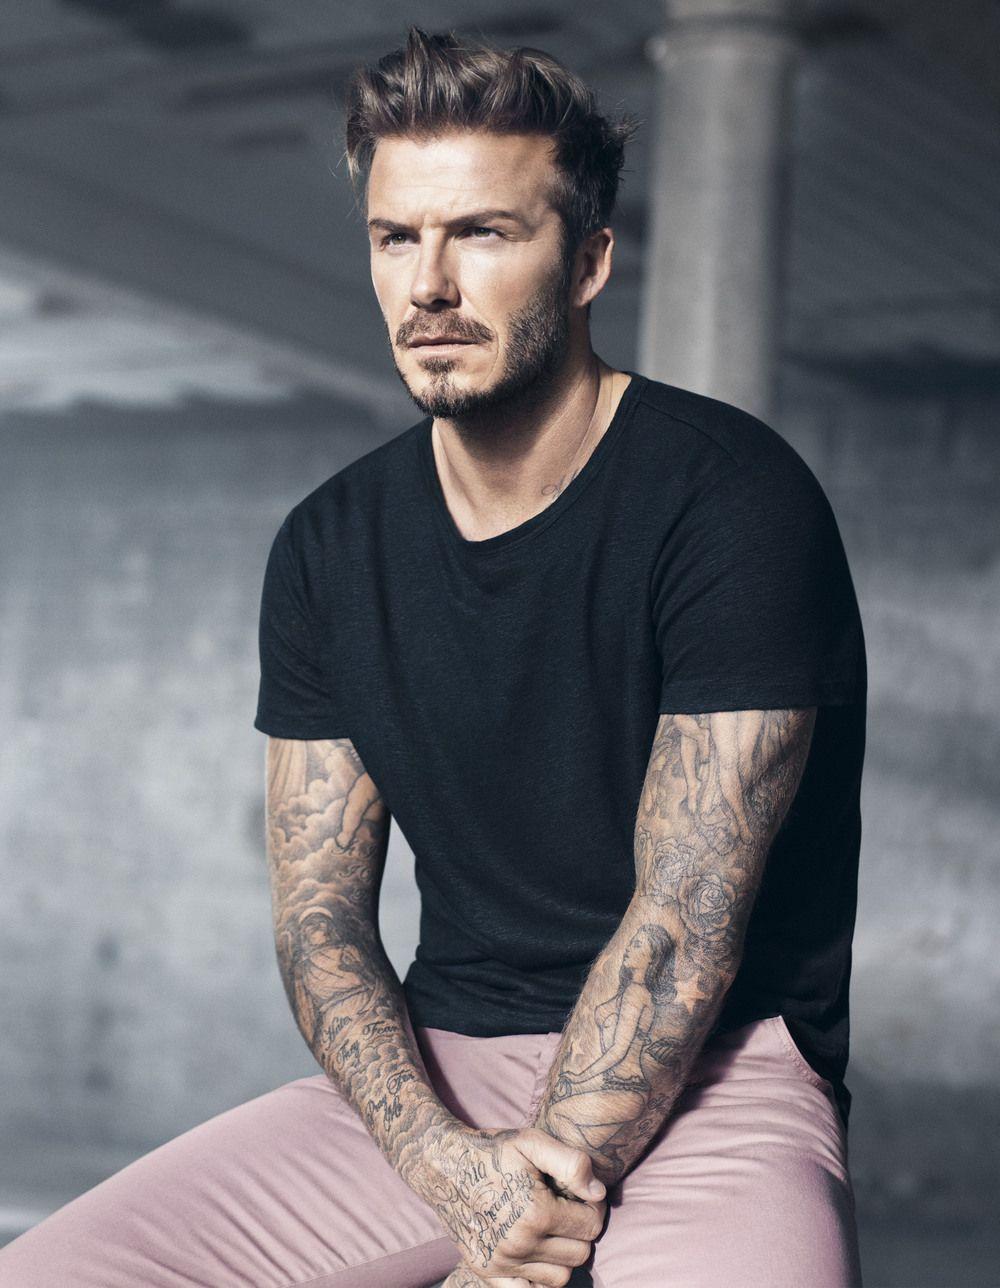 Haircuts for young men campaign denim men  buscar con google  poses masculinas